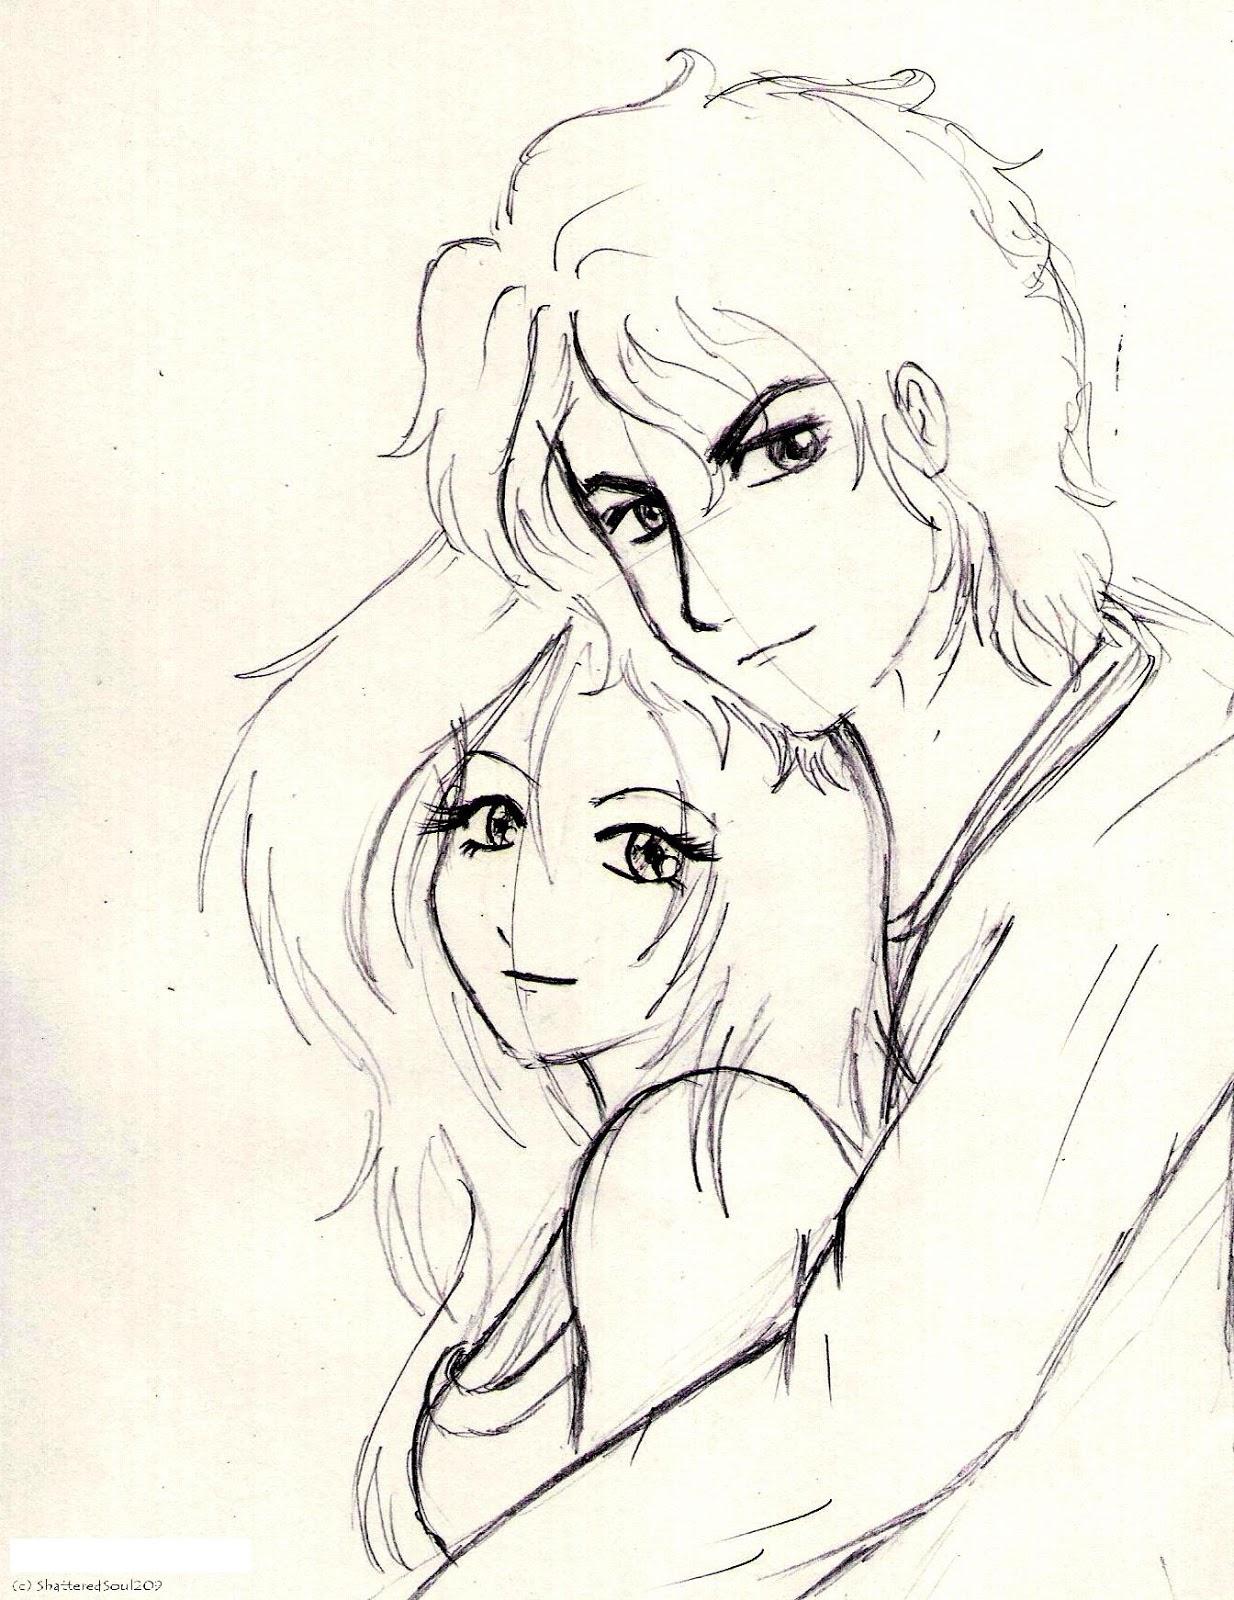 1234x1600 Photos Cute Couple Pencil Colored Sketches,